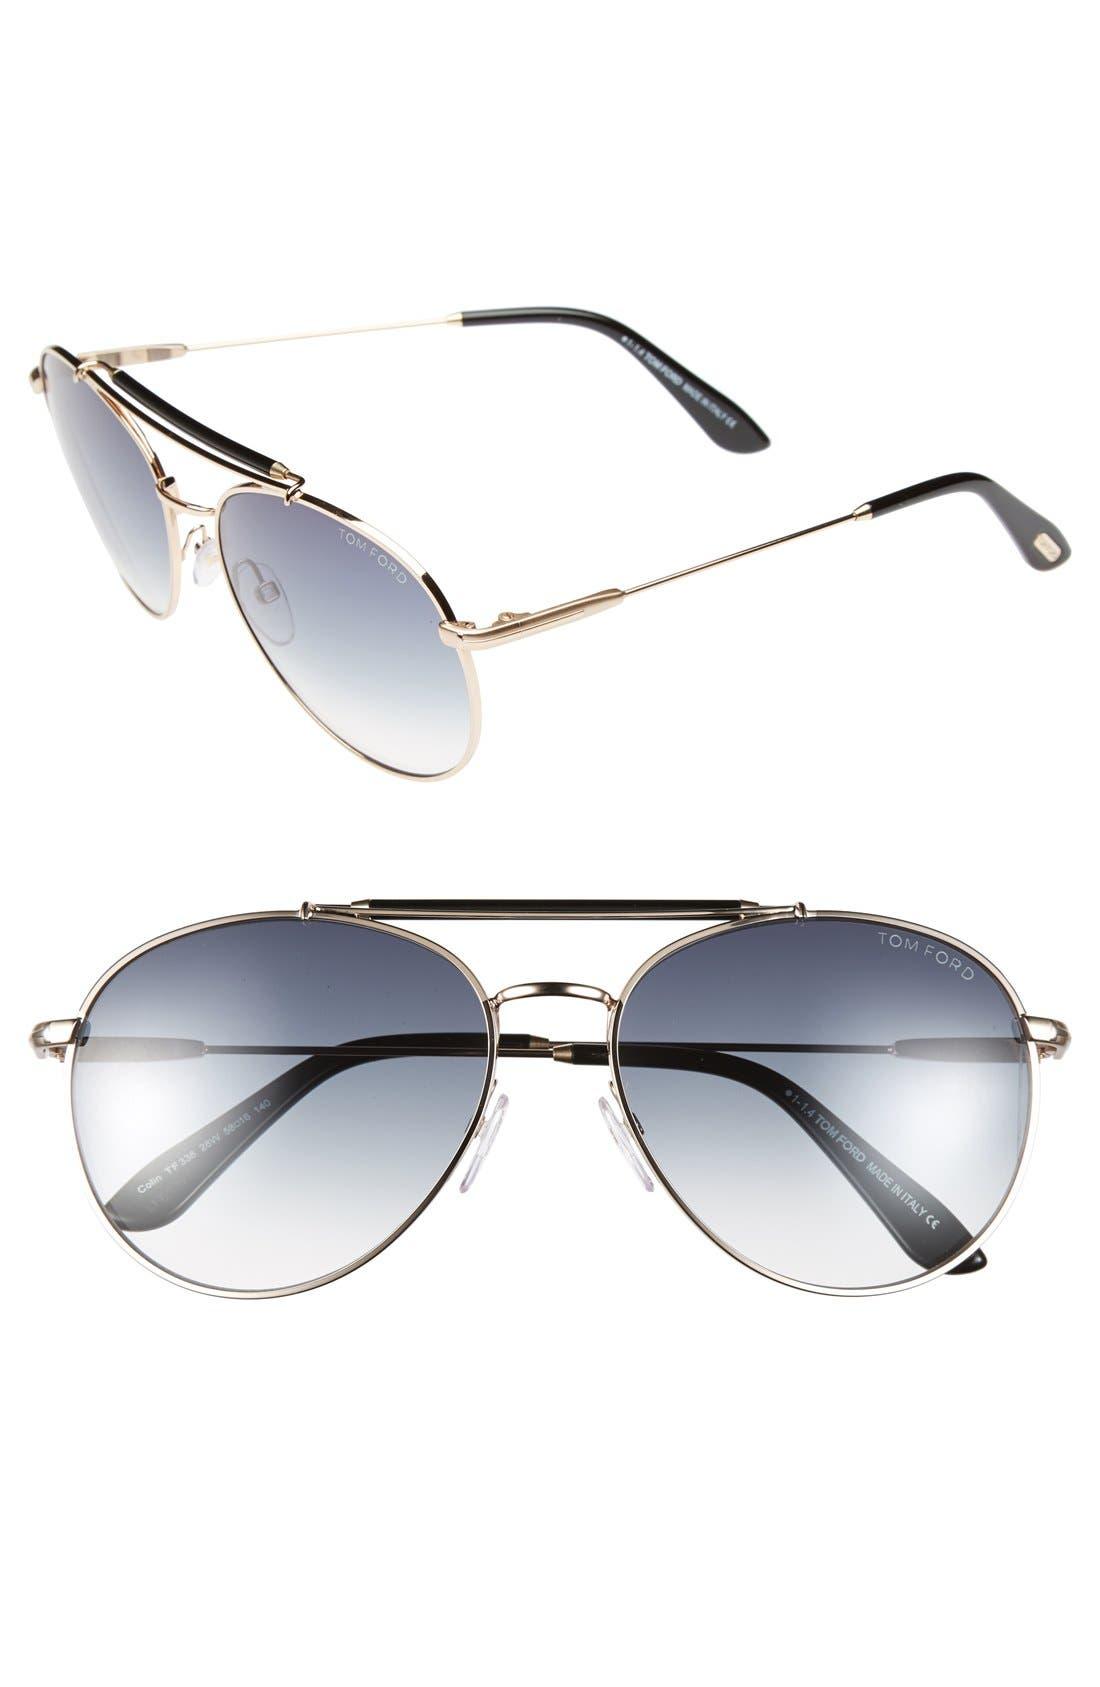 Alternate Image 1 Selected - Tom Ford 'Colin' 58mm Aviator Sunglasses